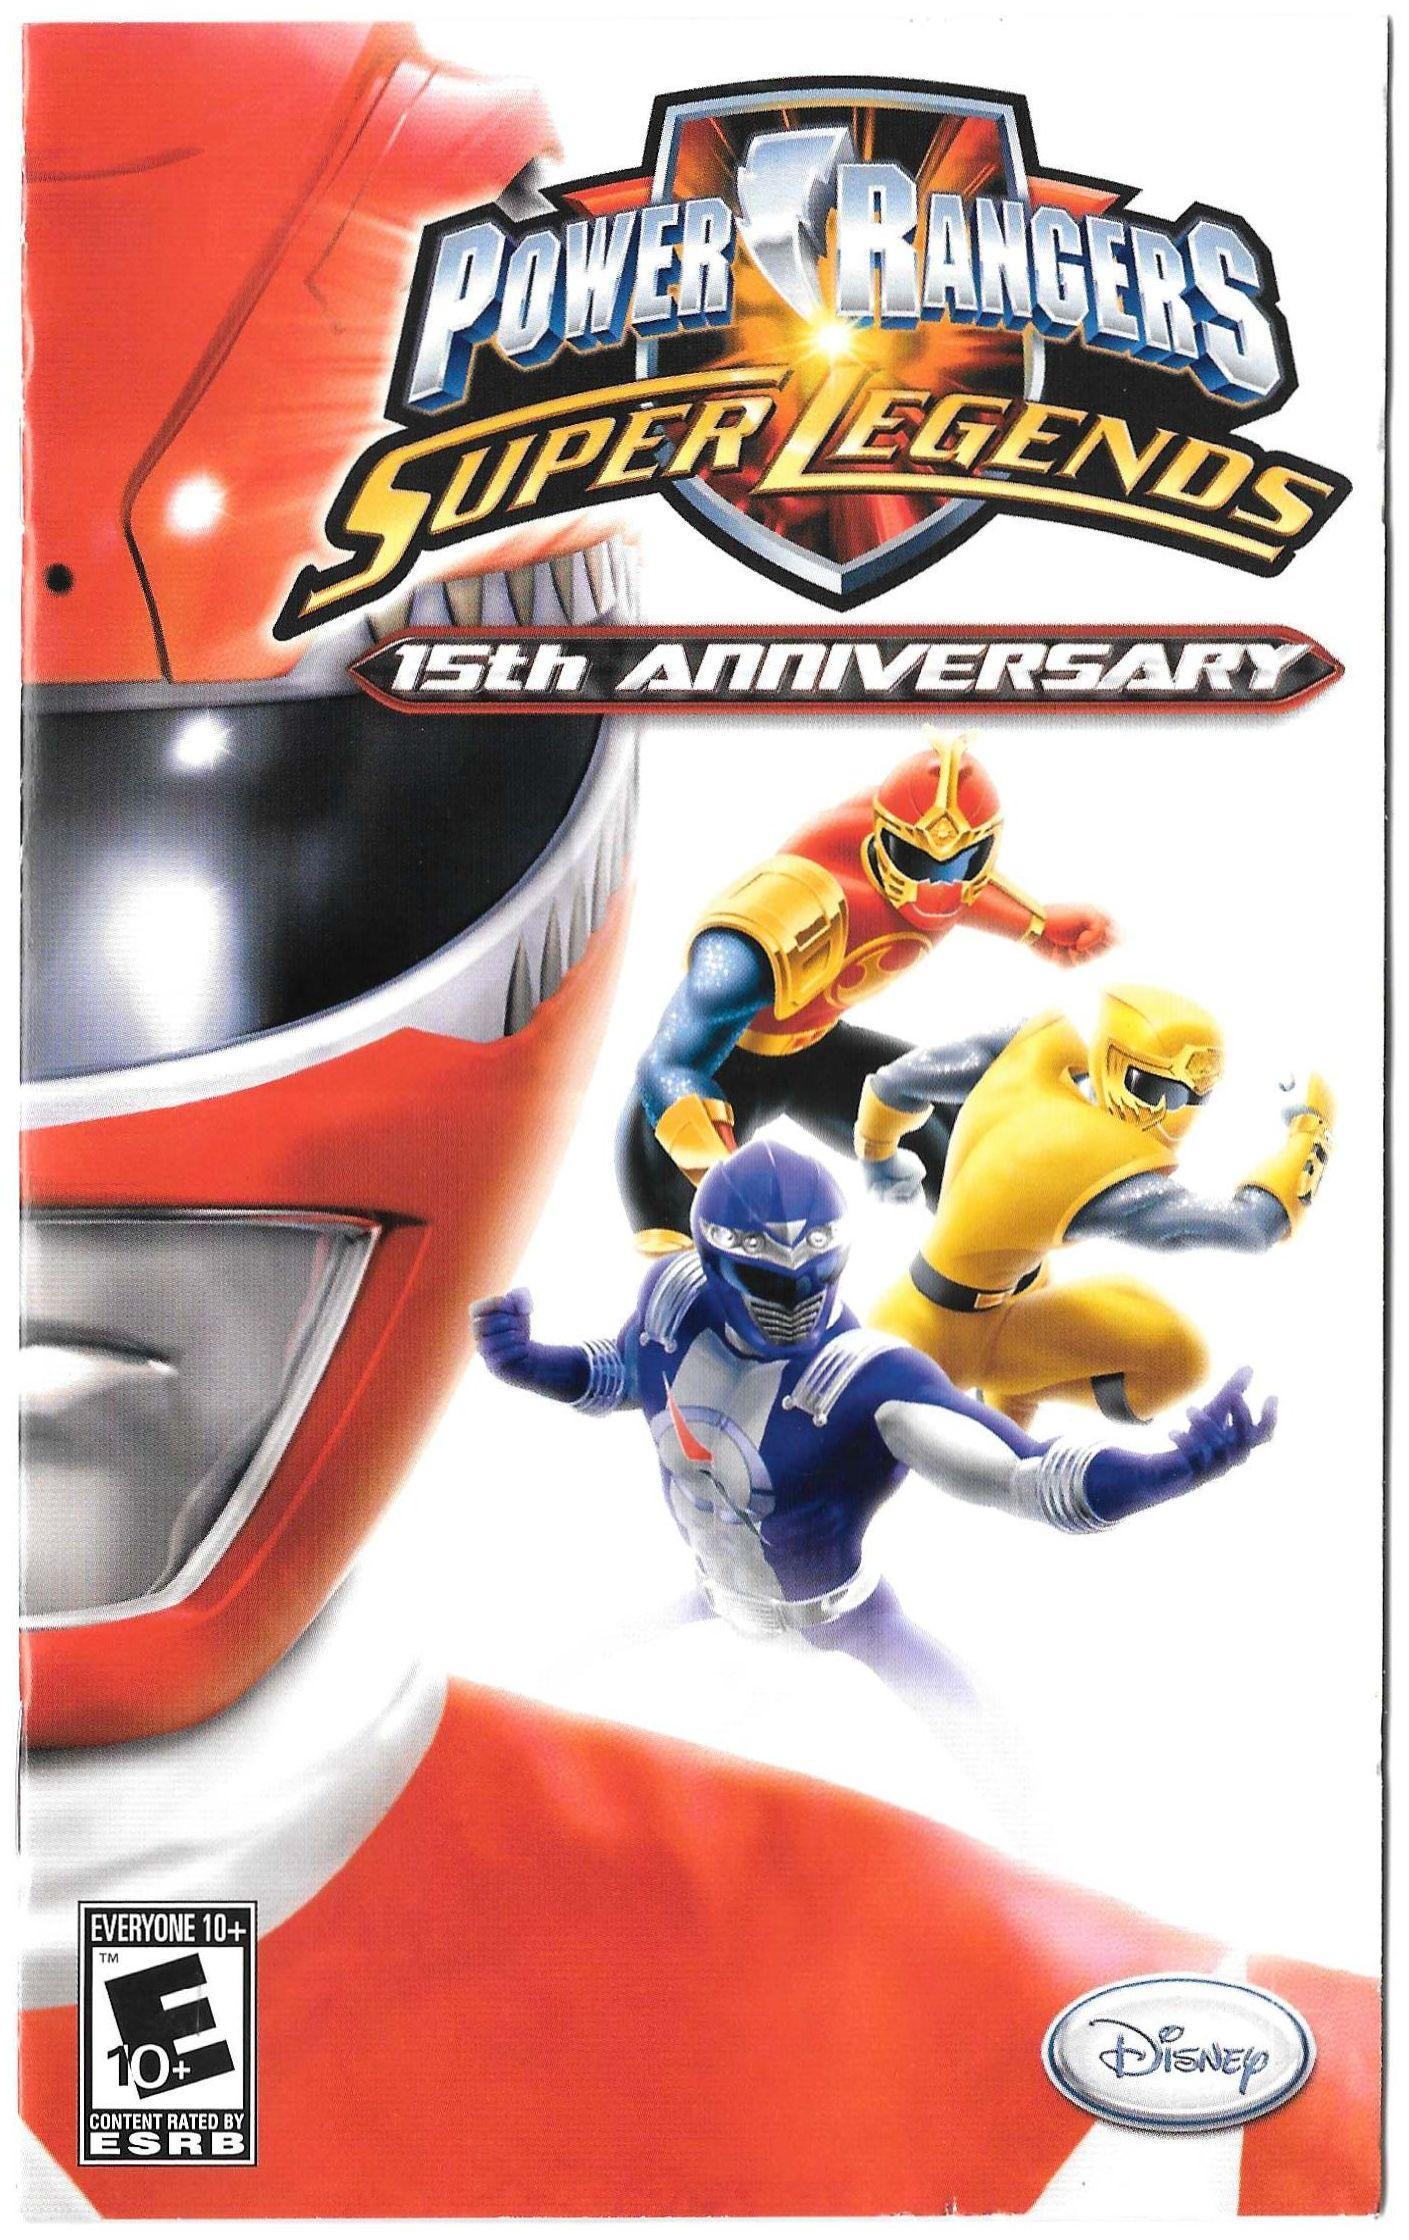 Power Rangers: Super Legends manual (PS2)